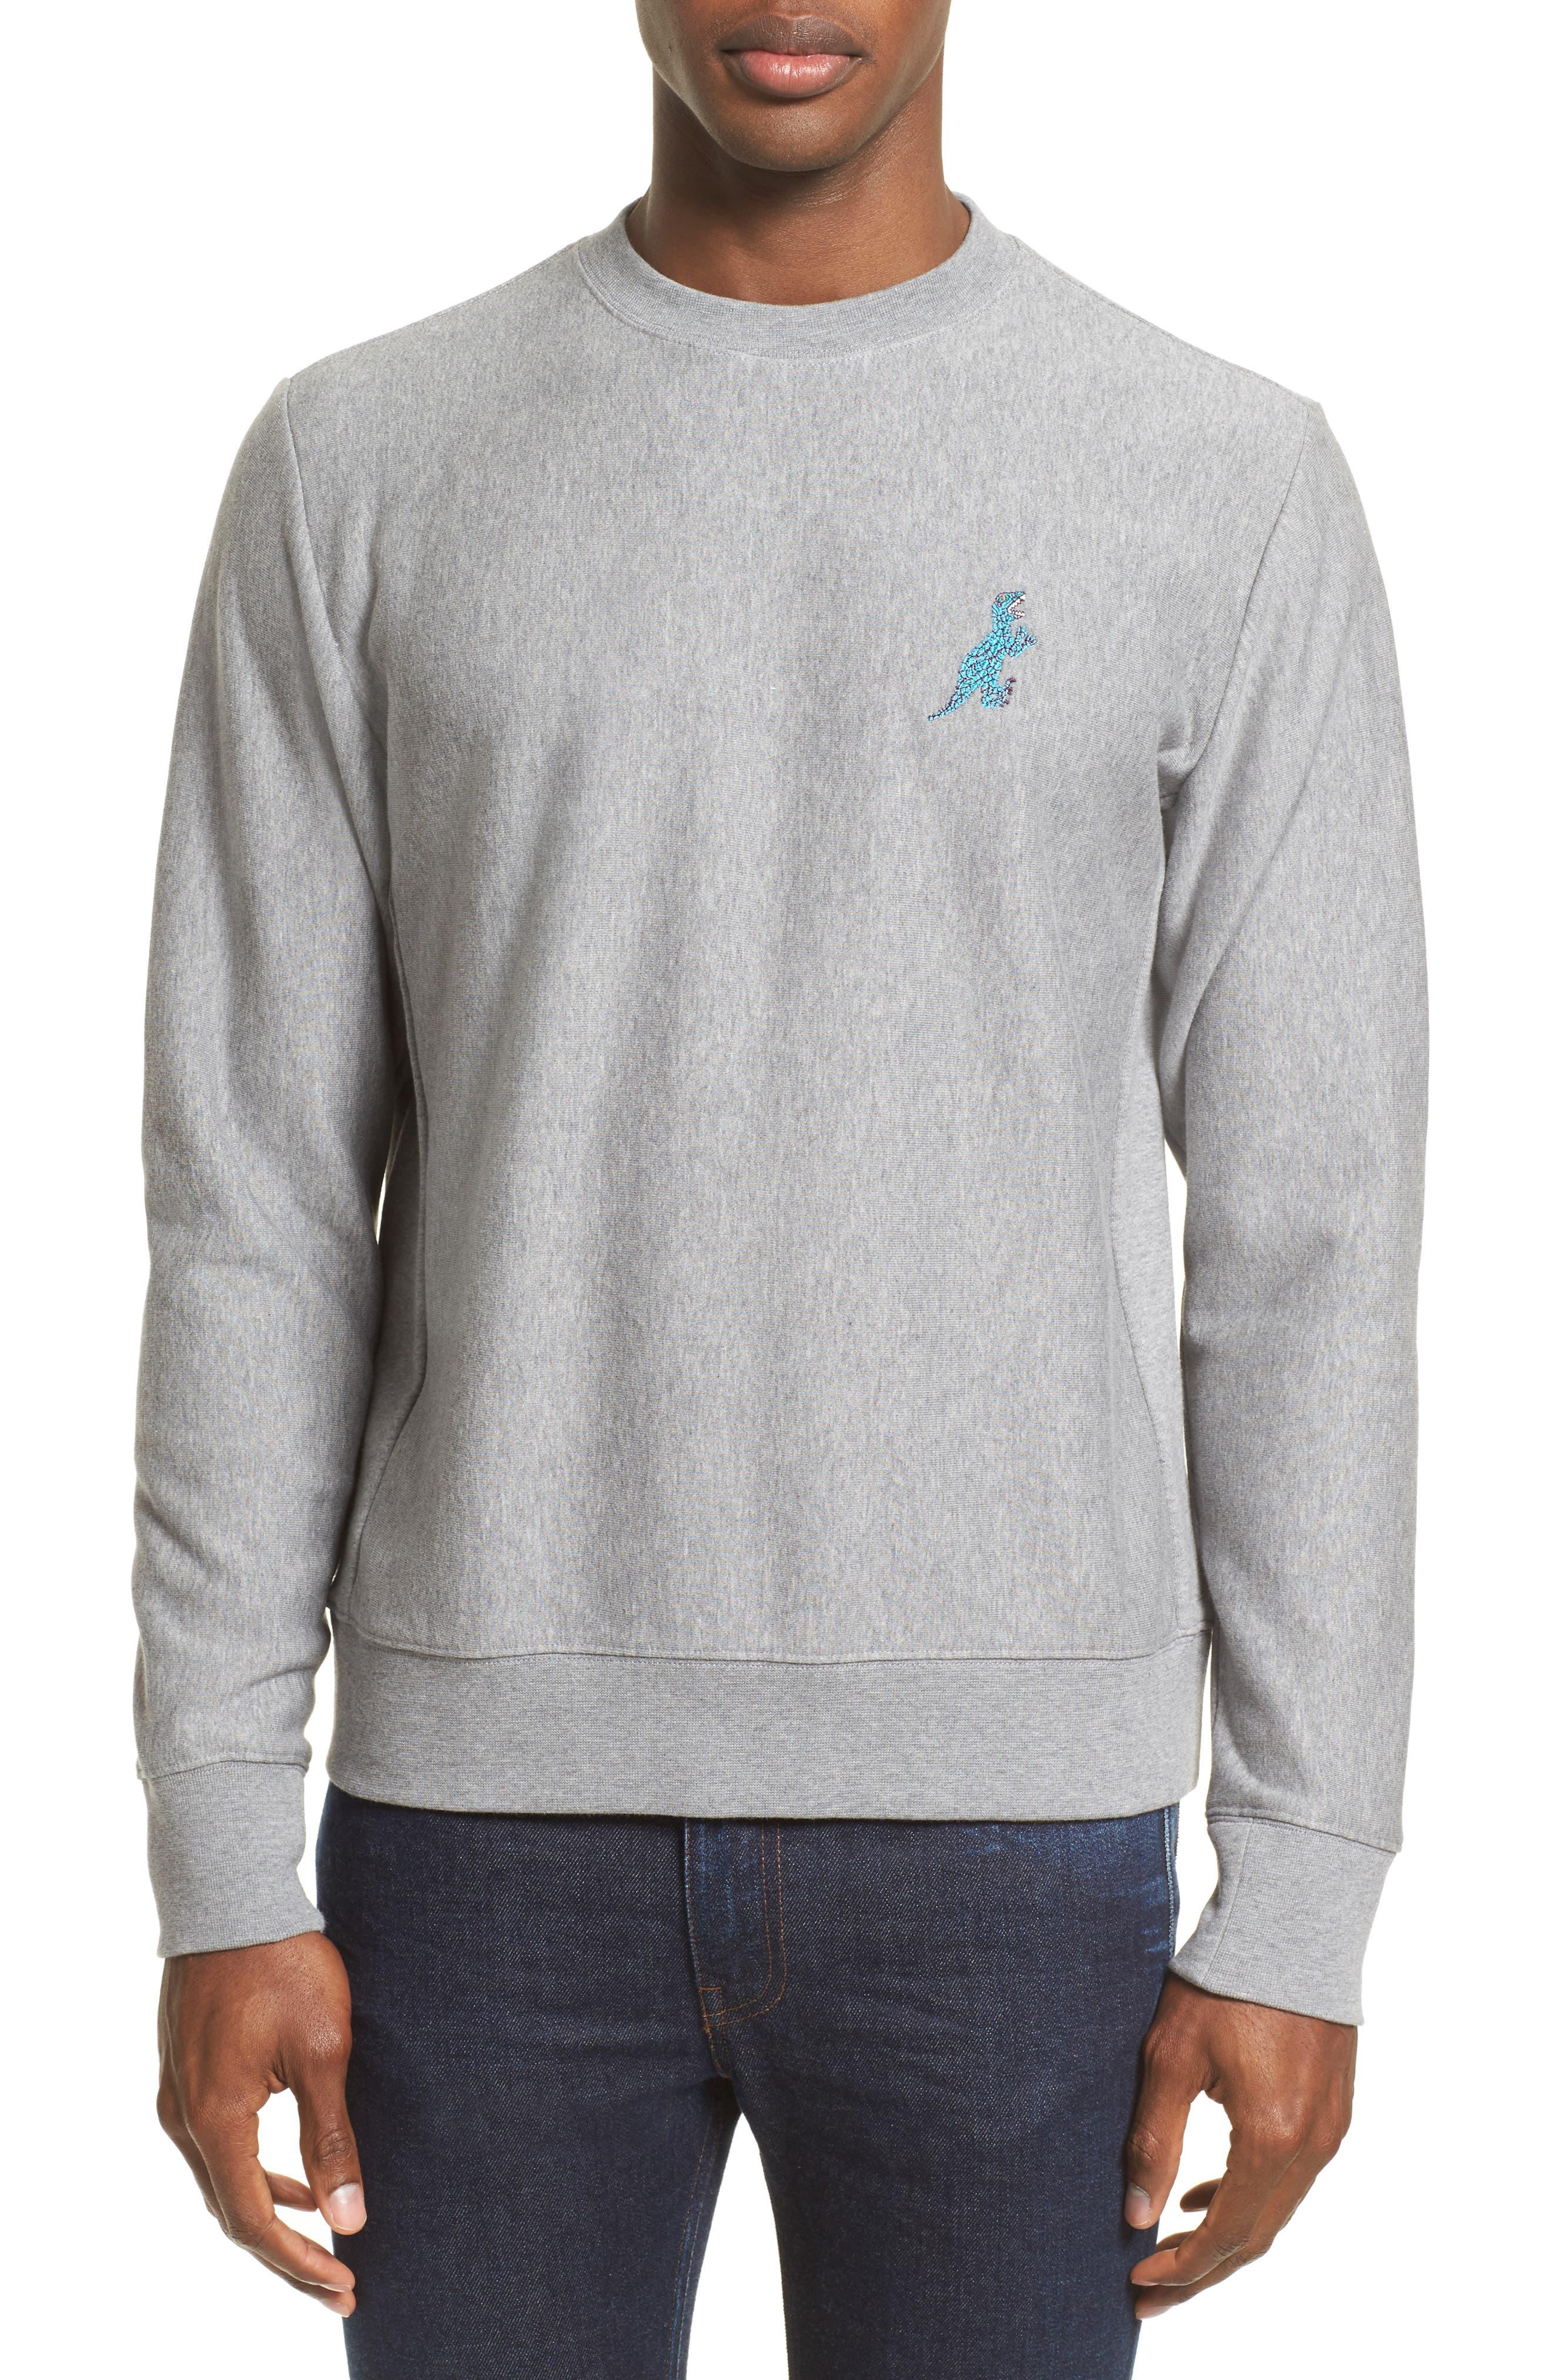 Dino Dino Embroidered Sweatshirt,                         Main,                         color, Grey